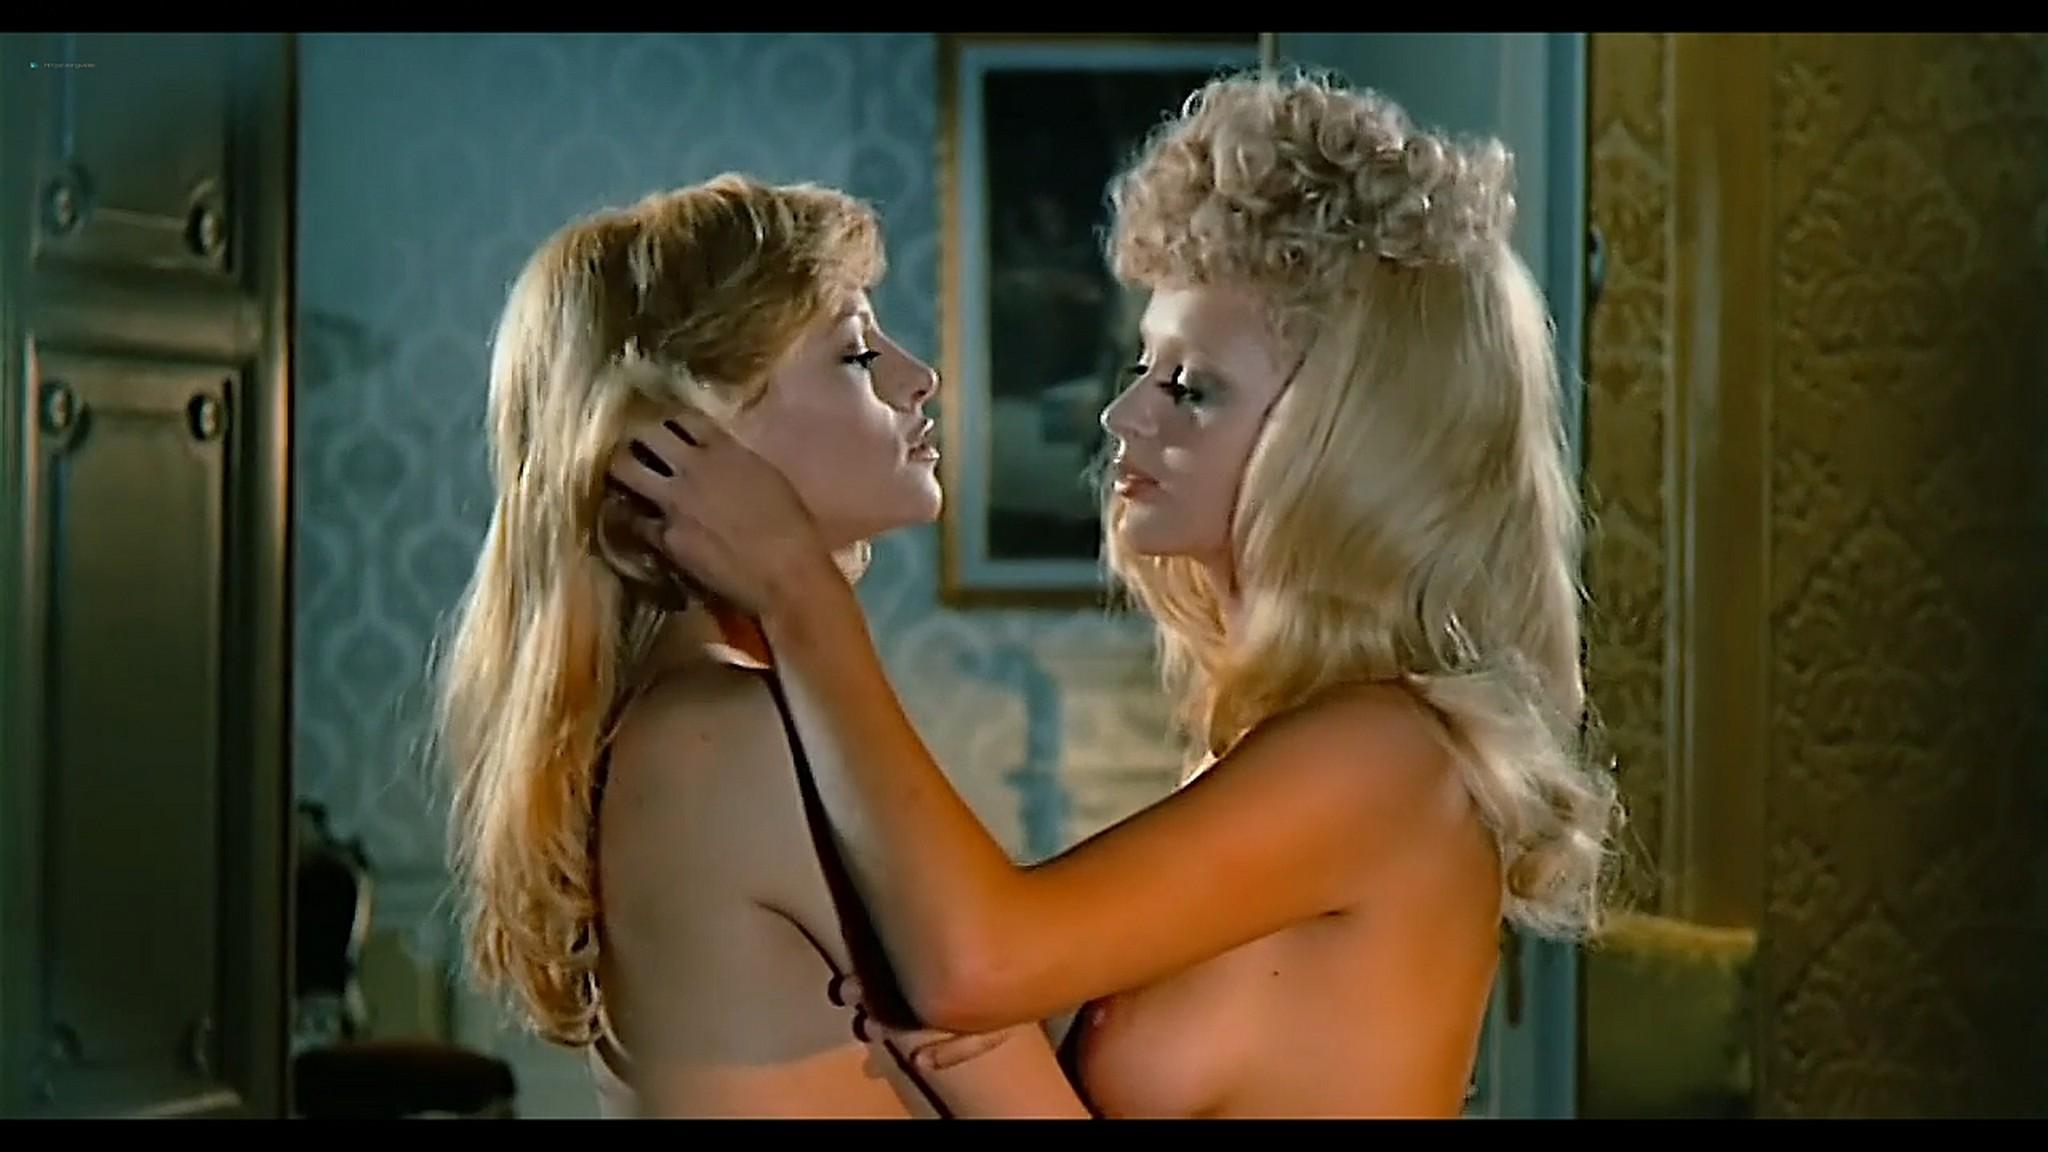 Joey Heatherton nude topless Sybil Danning Karin Schubert and others nude Bluebeard 1972 720p 05